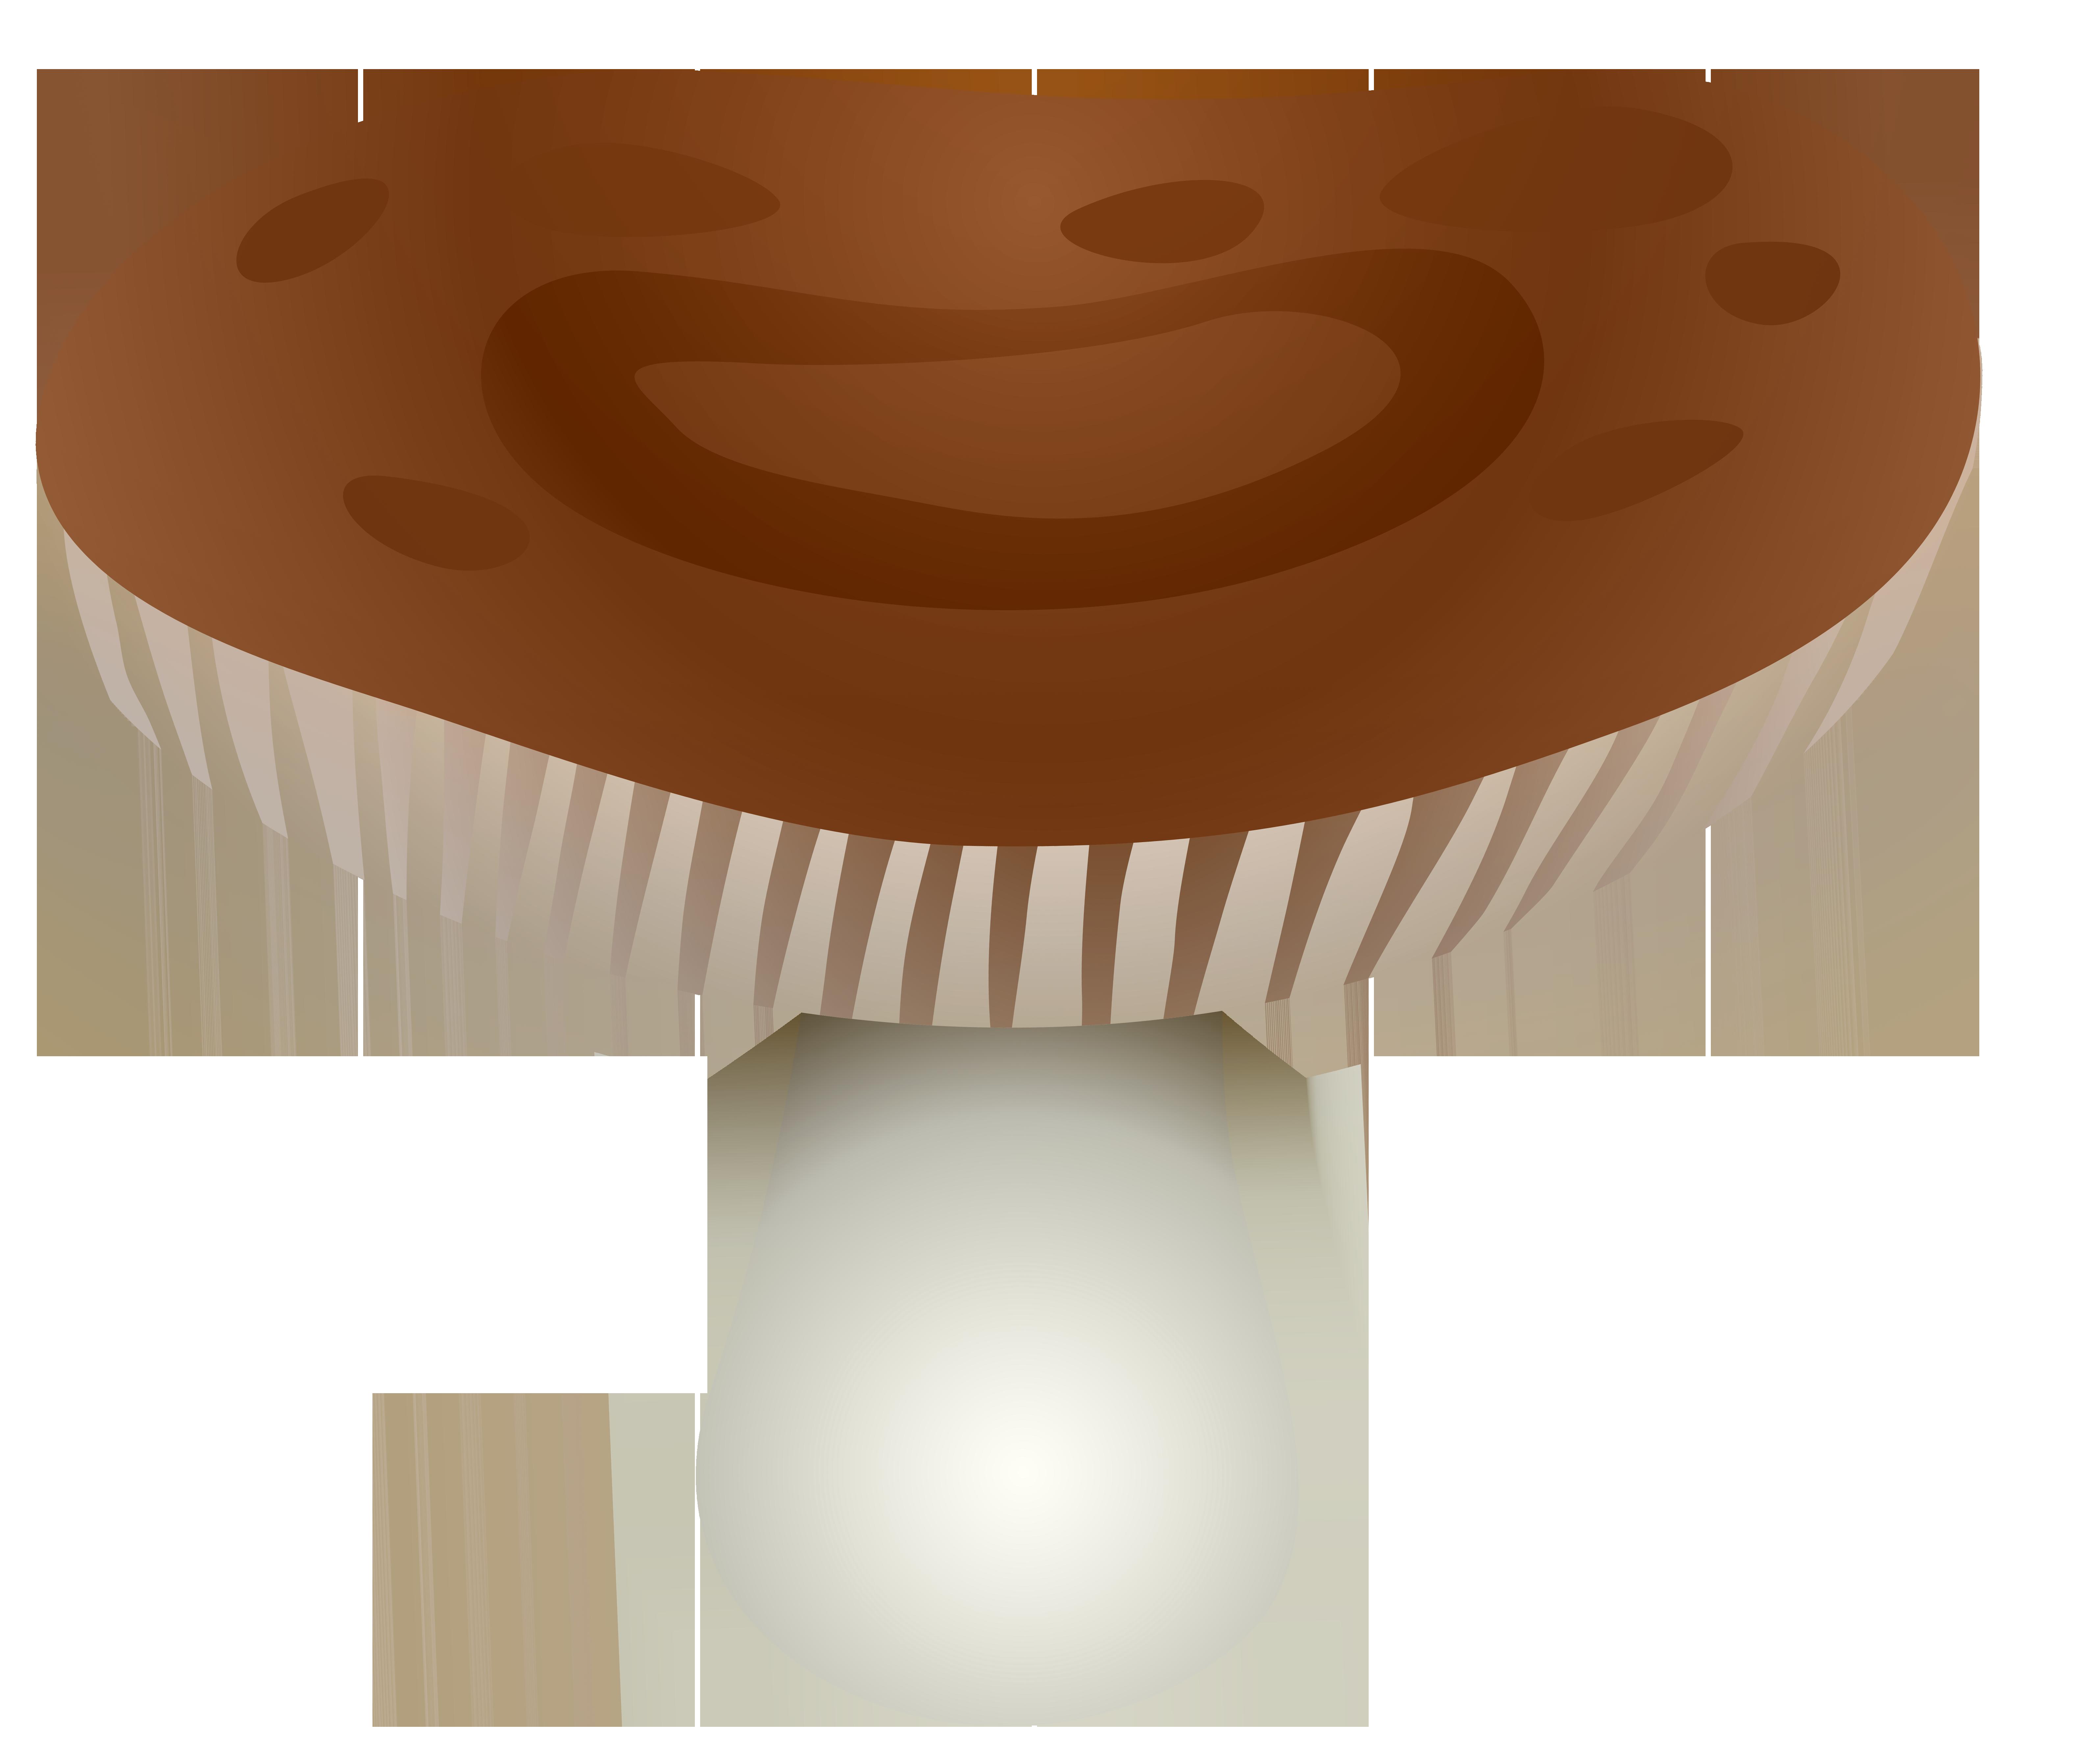 Brown transparent png best. Mushroom clipart mushroom home